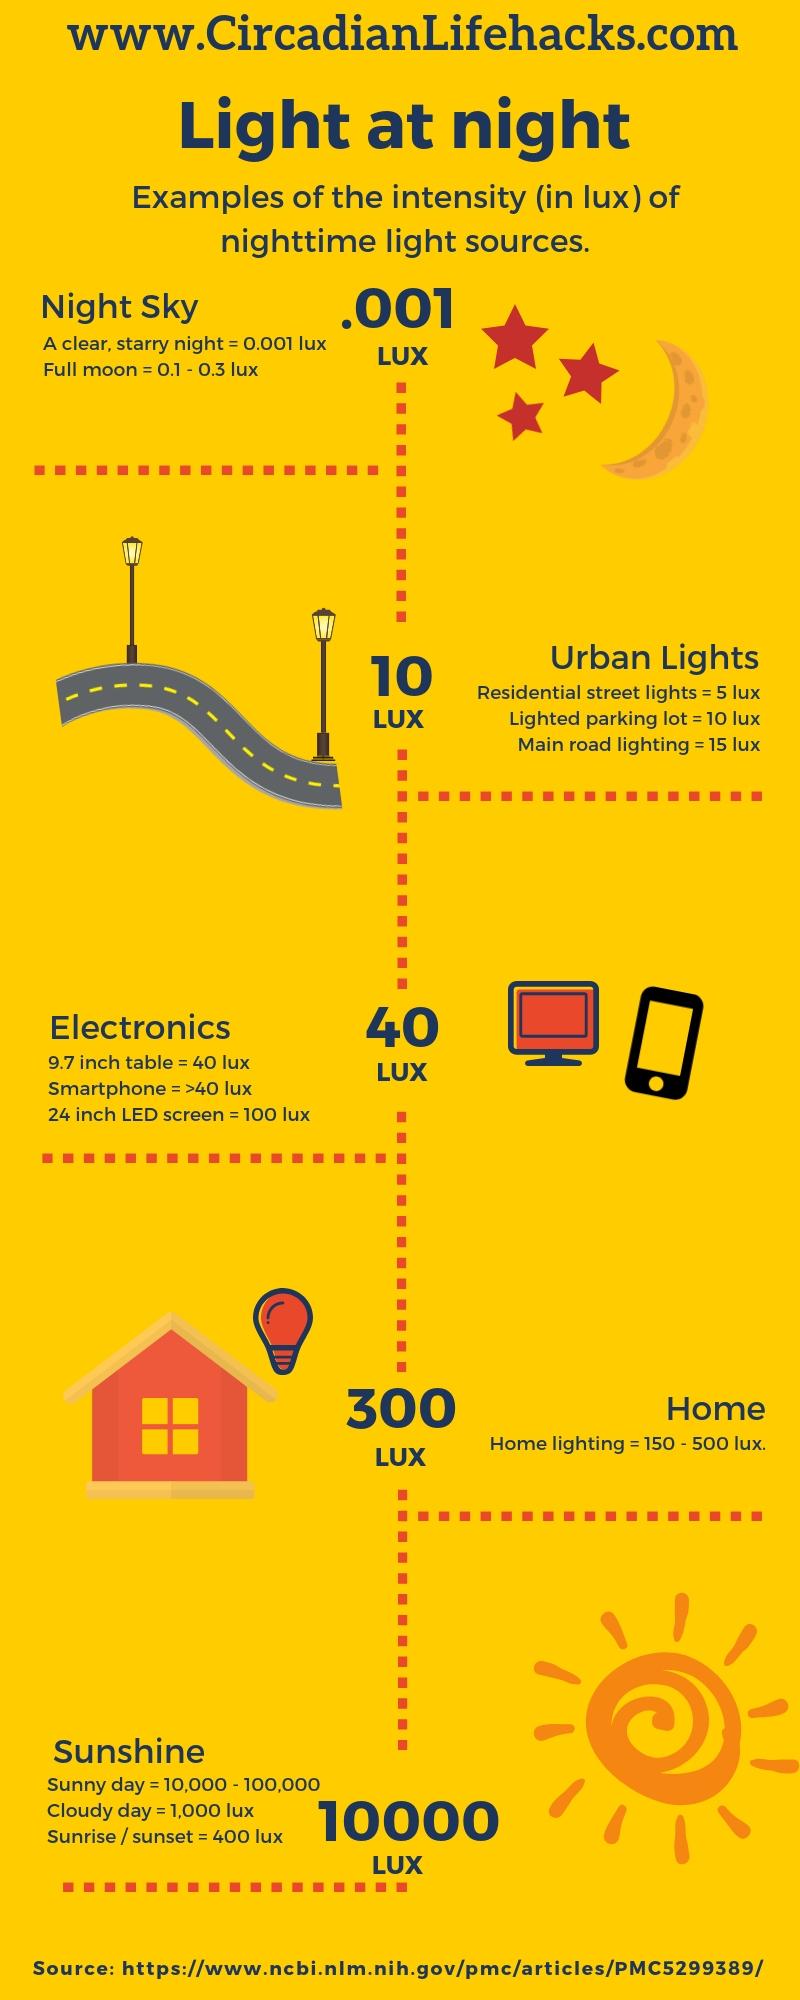 Infographic explaining LUX - Circadian Lifehacks